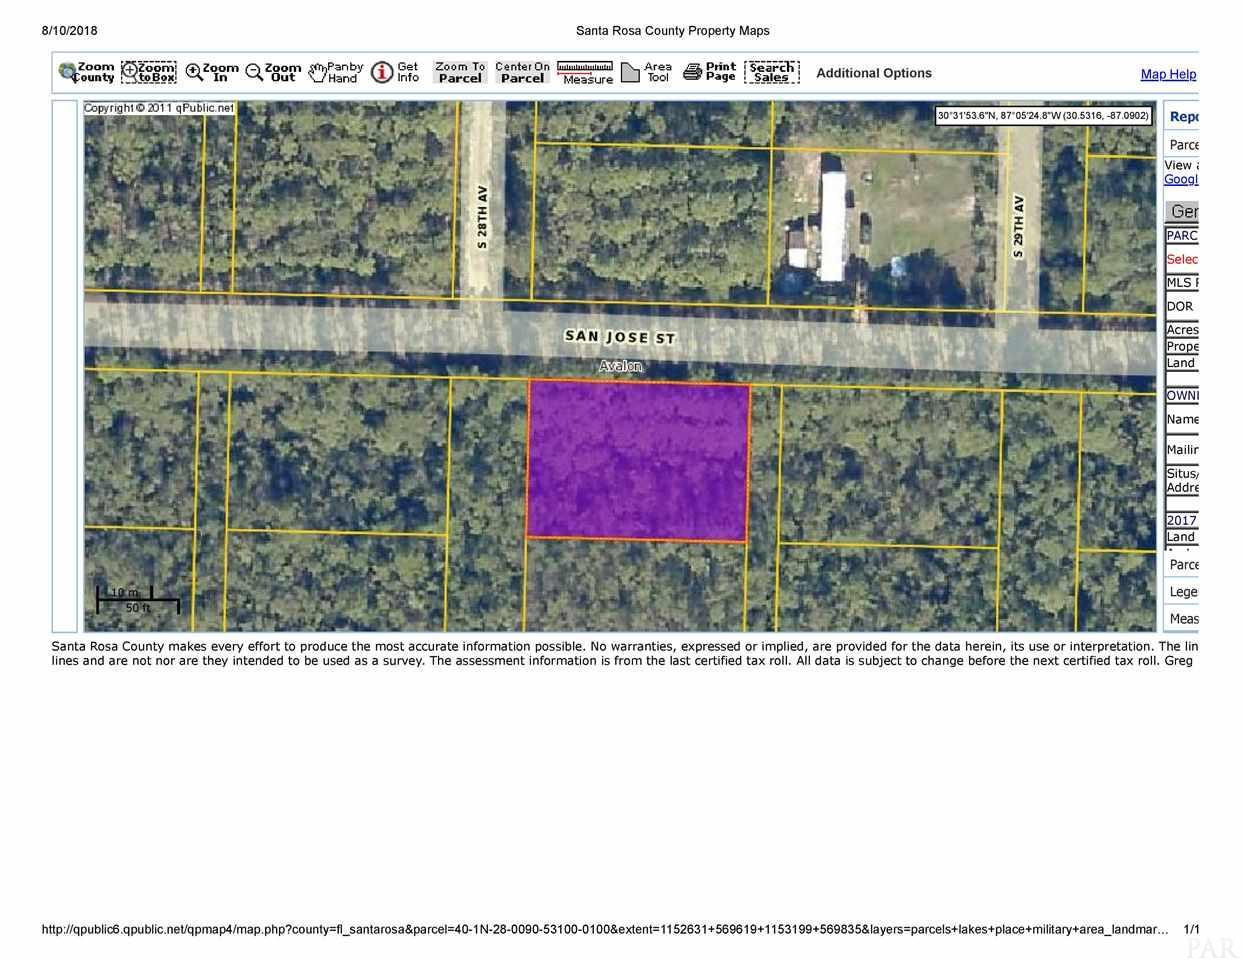 Lot 23 Blk 237 S 28th Ave, Milton, FL 32583